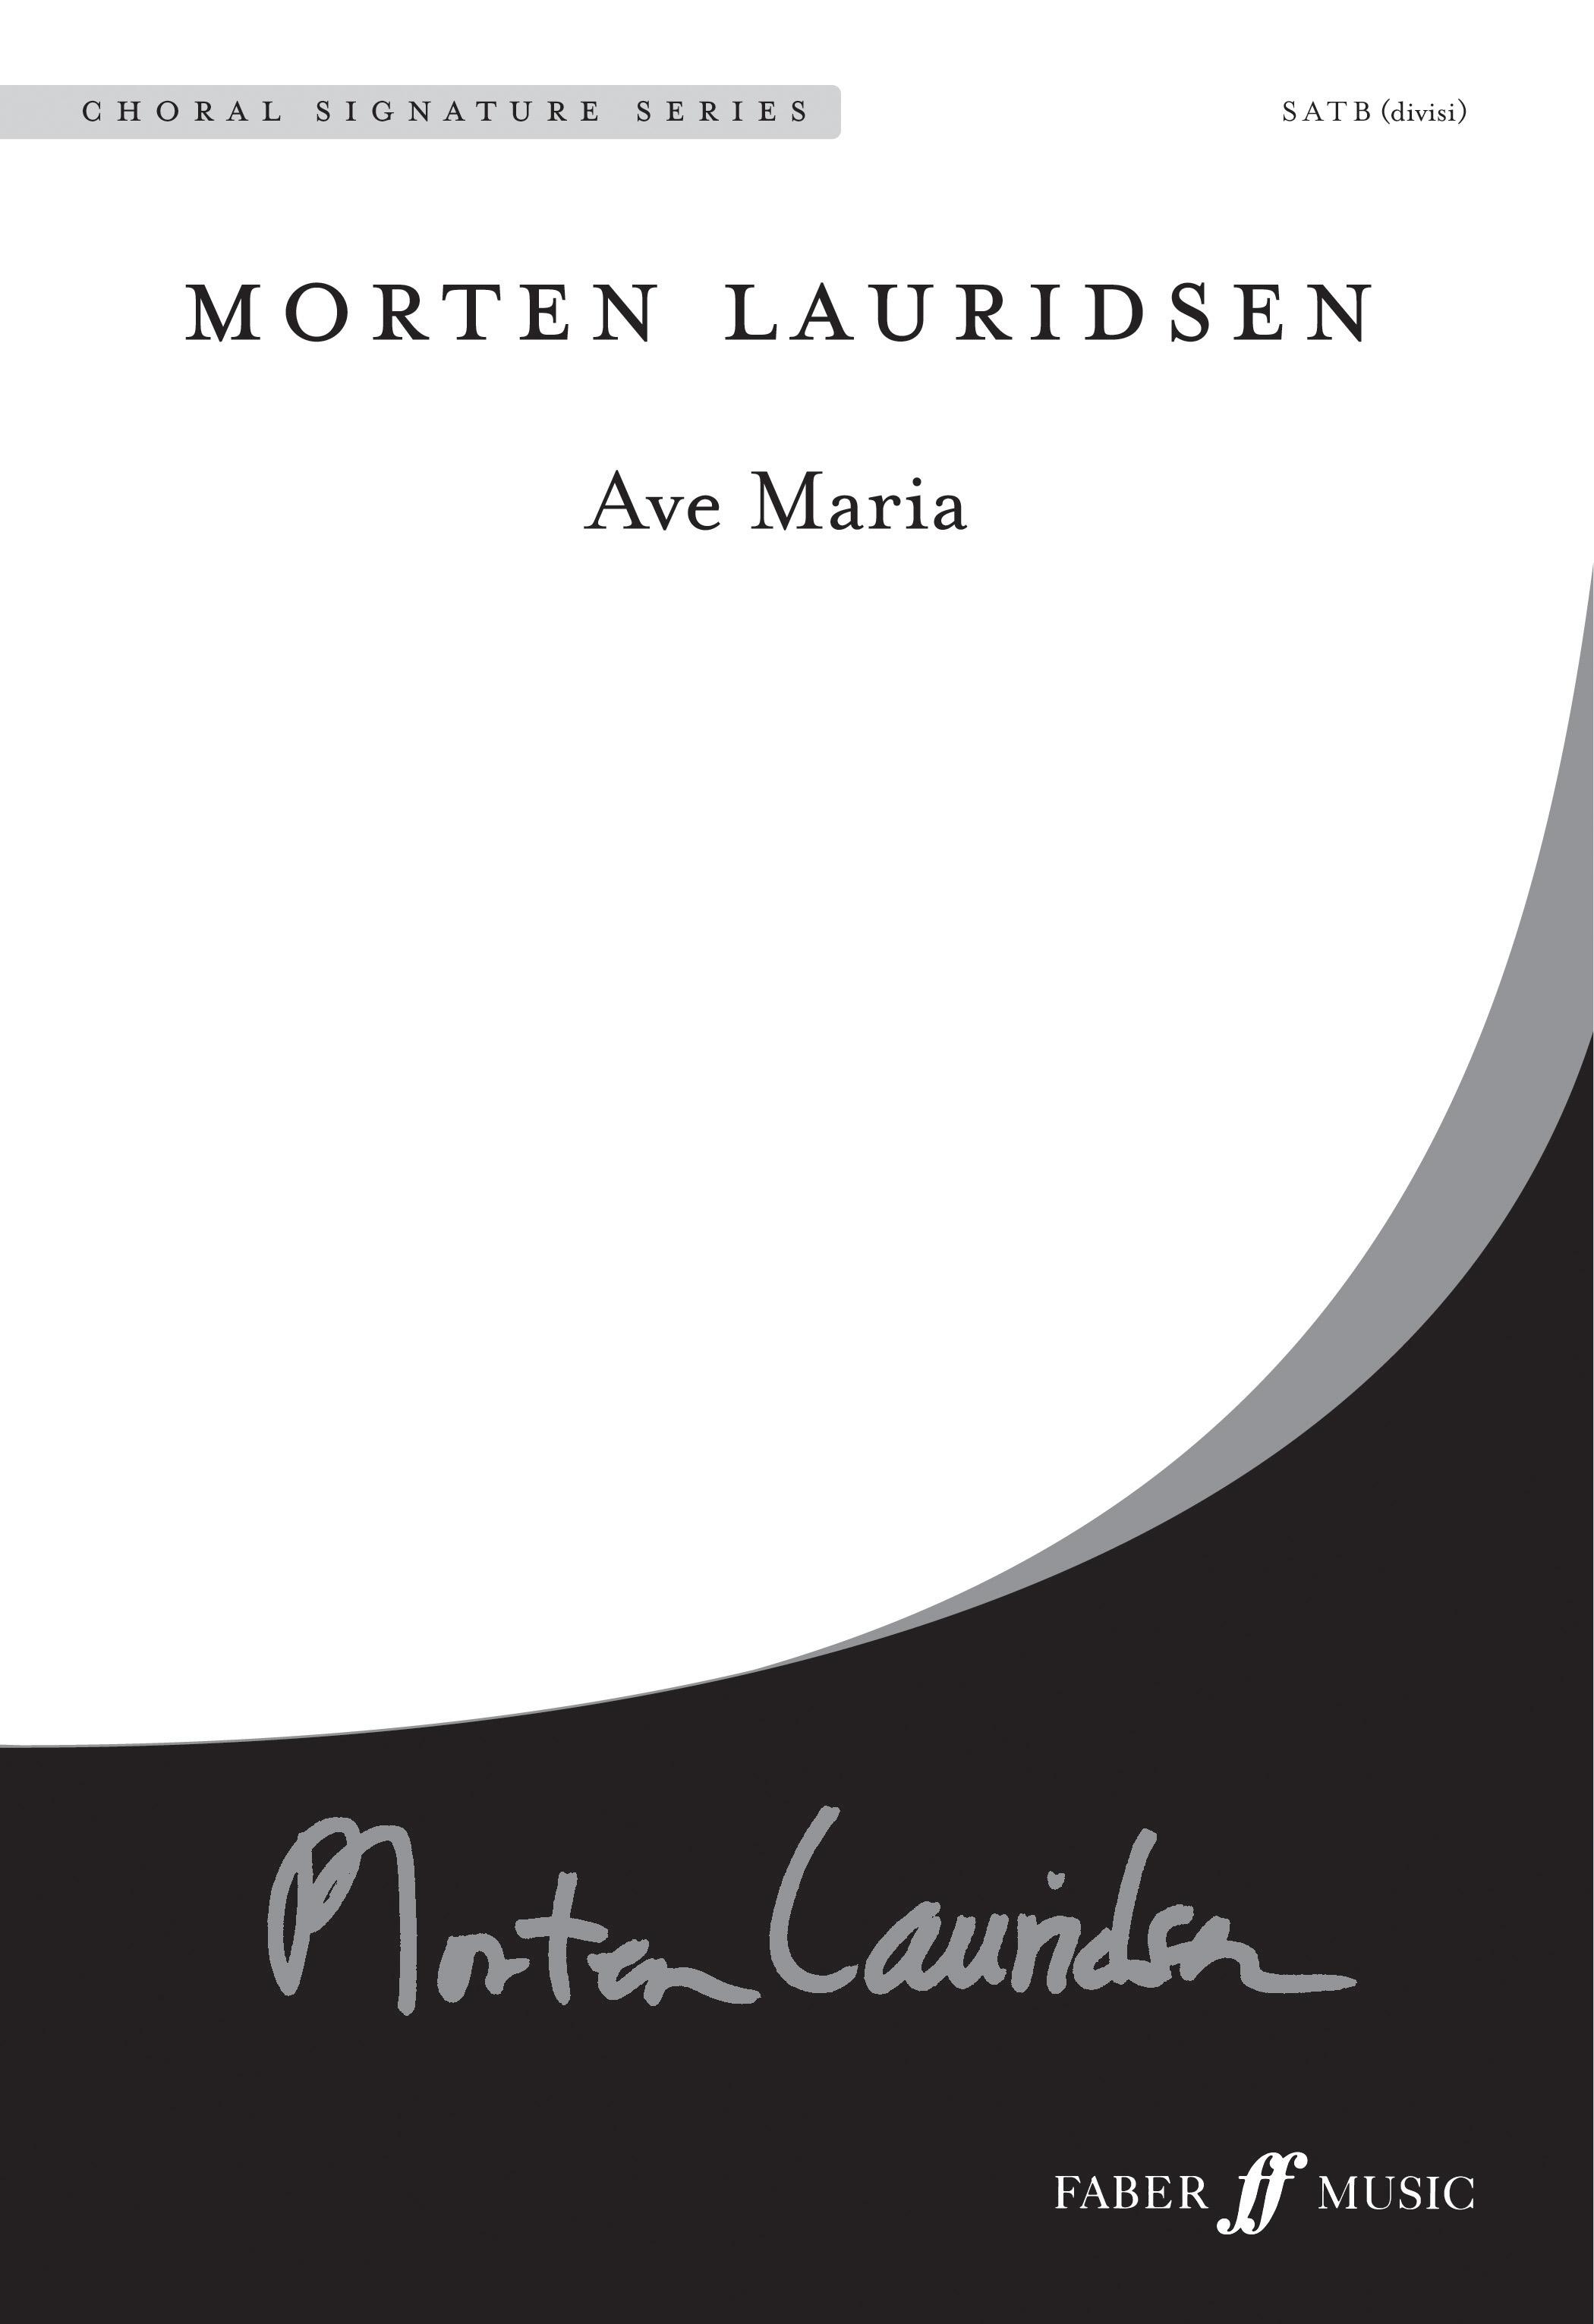 Morten Lauridsen: Ave Maria: SATB: Vocal Score